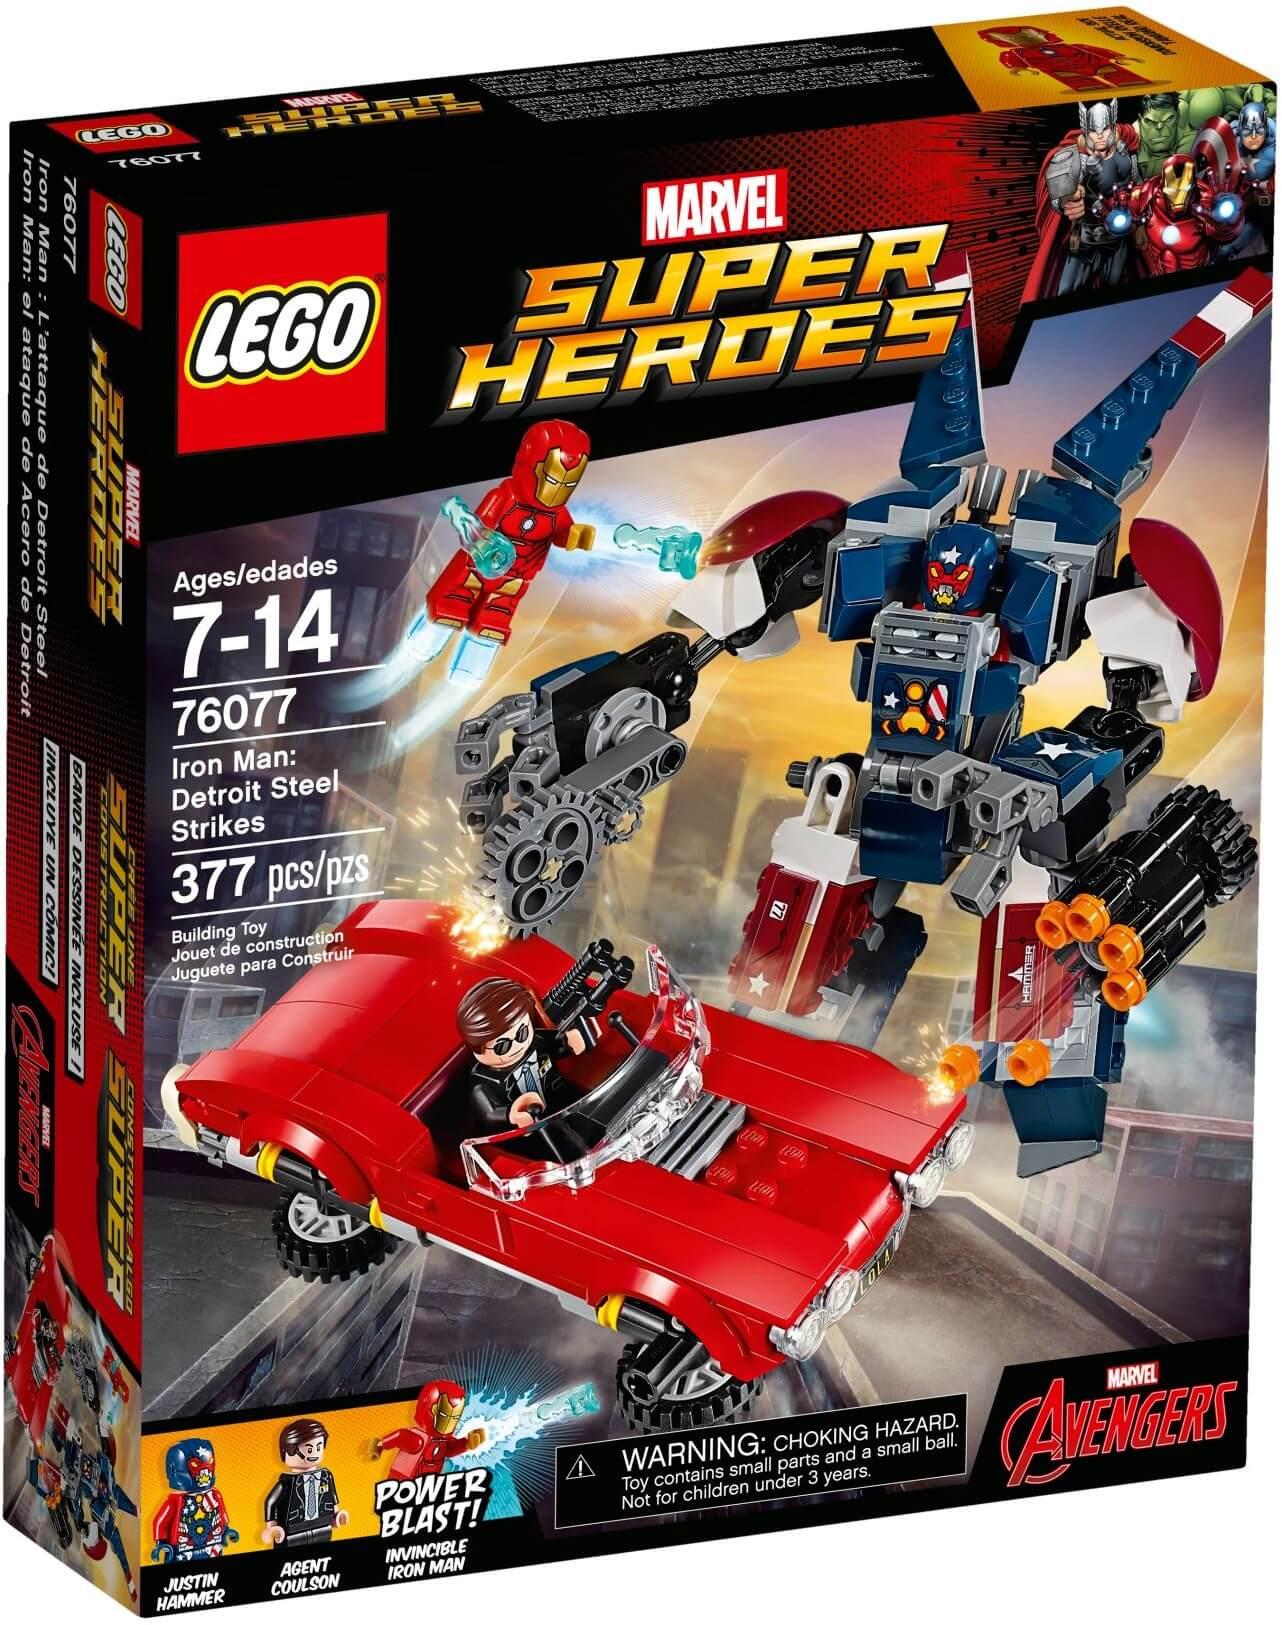 Mua đồ chơi LEGO 76077 - LEGO 76077 - Iron Man đại chiến Người Máy Detroit Steel (LEGO Marvel Super Heroes 76077 - Iron Man: Detroit Steel Strikes)